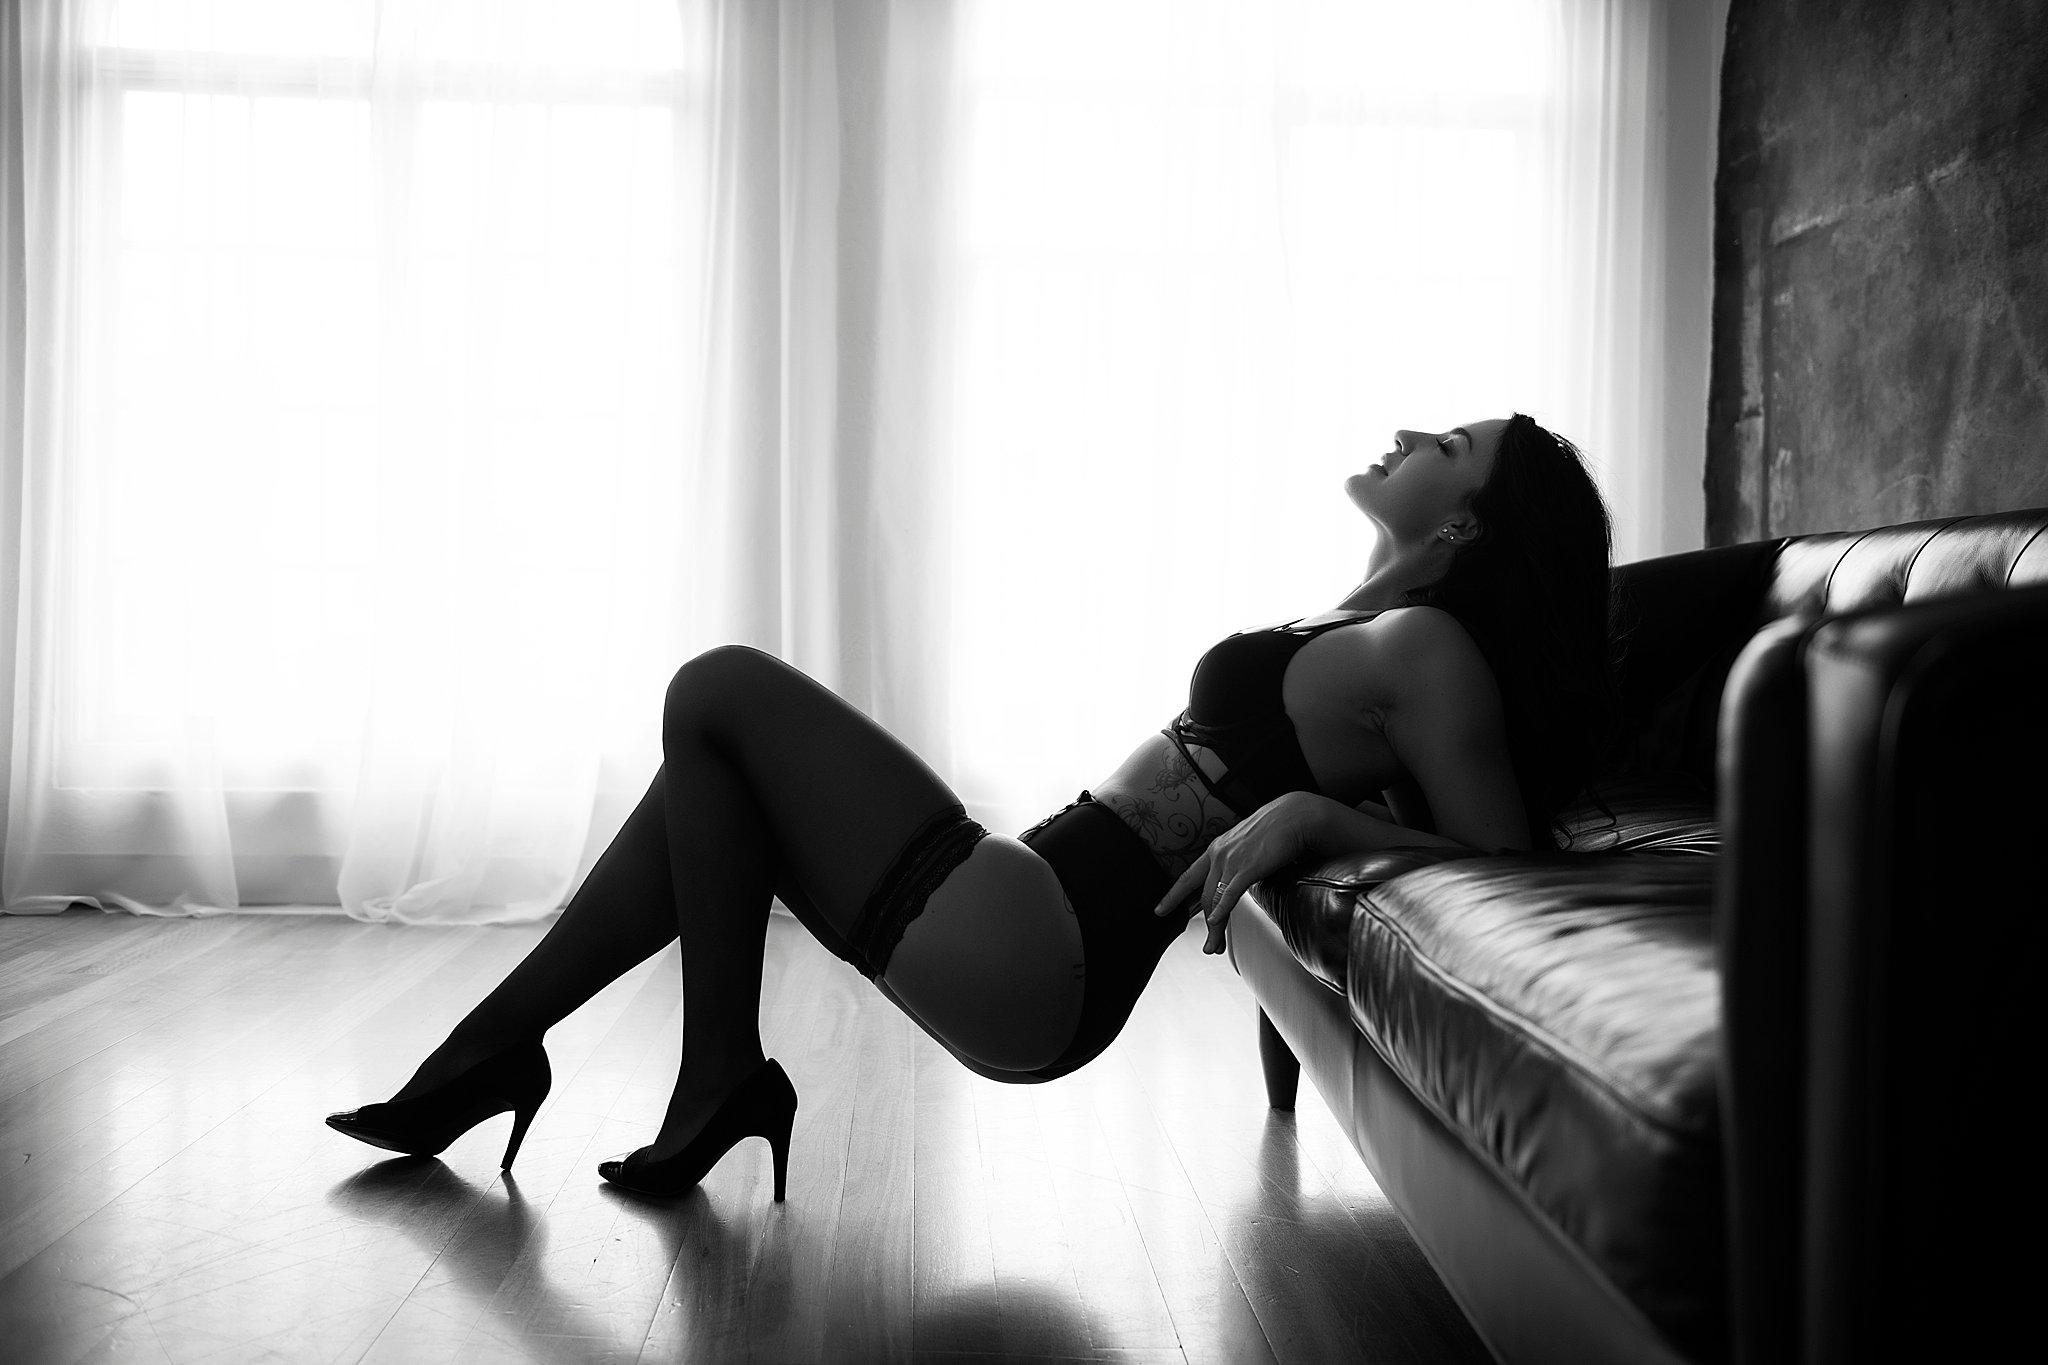 Intimate-boudoir-photoshoot-007.jpg